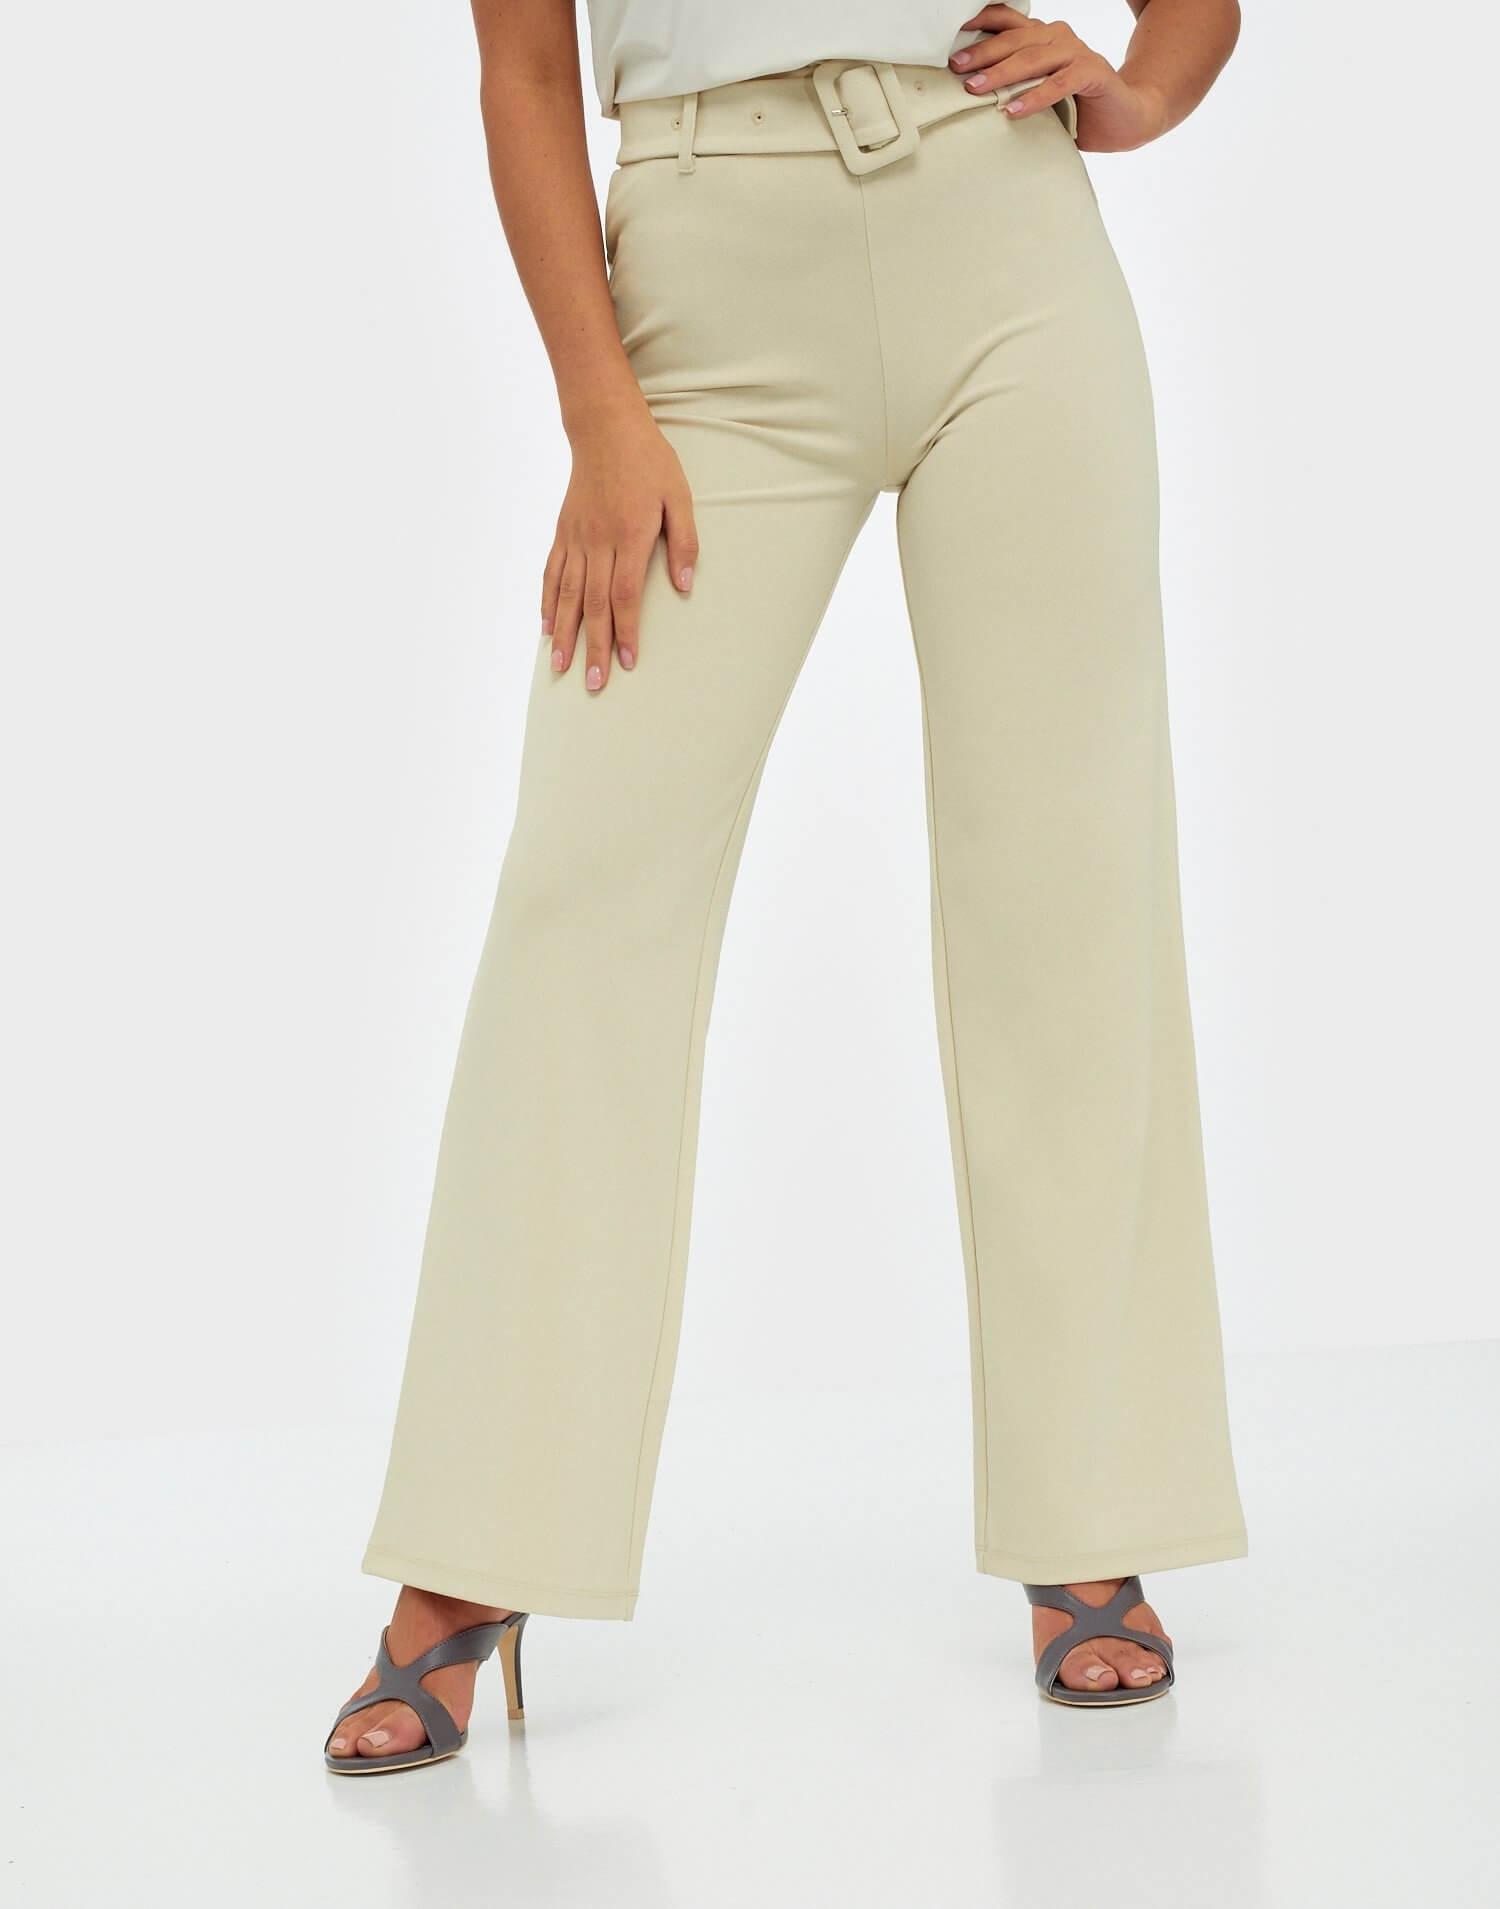 Stretchiga byxor i beige färg från NLY Trend.